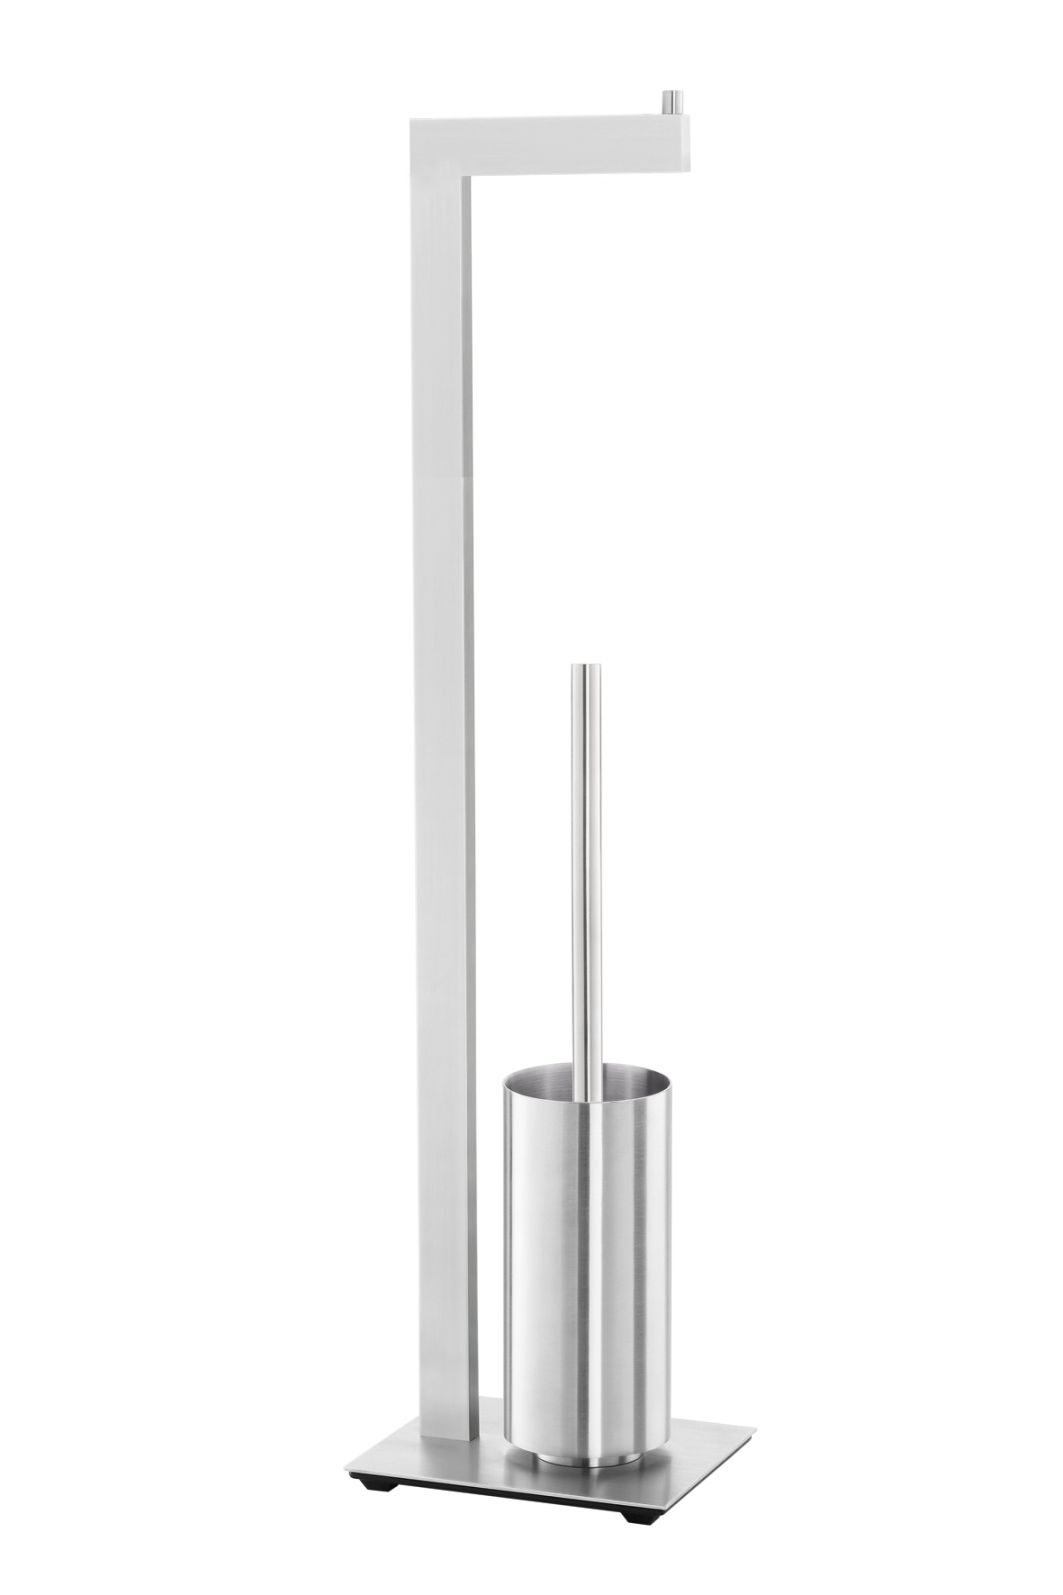 WC sada LINEA, matná 72,5 cm - ZACK